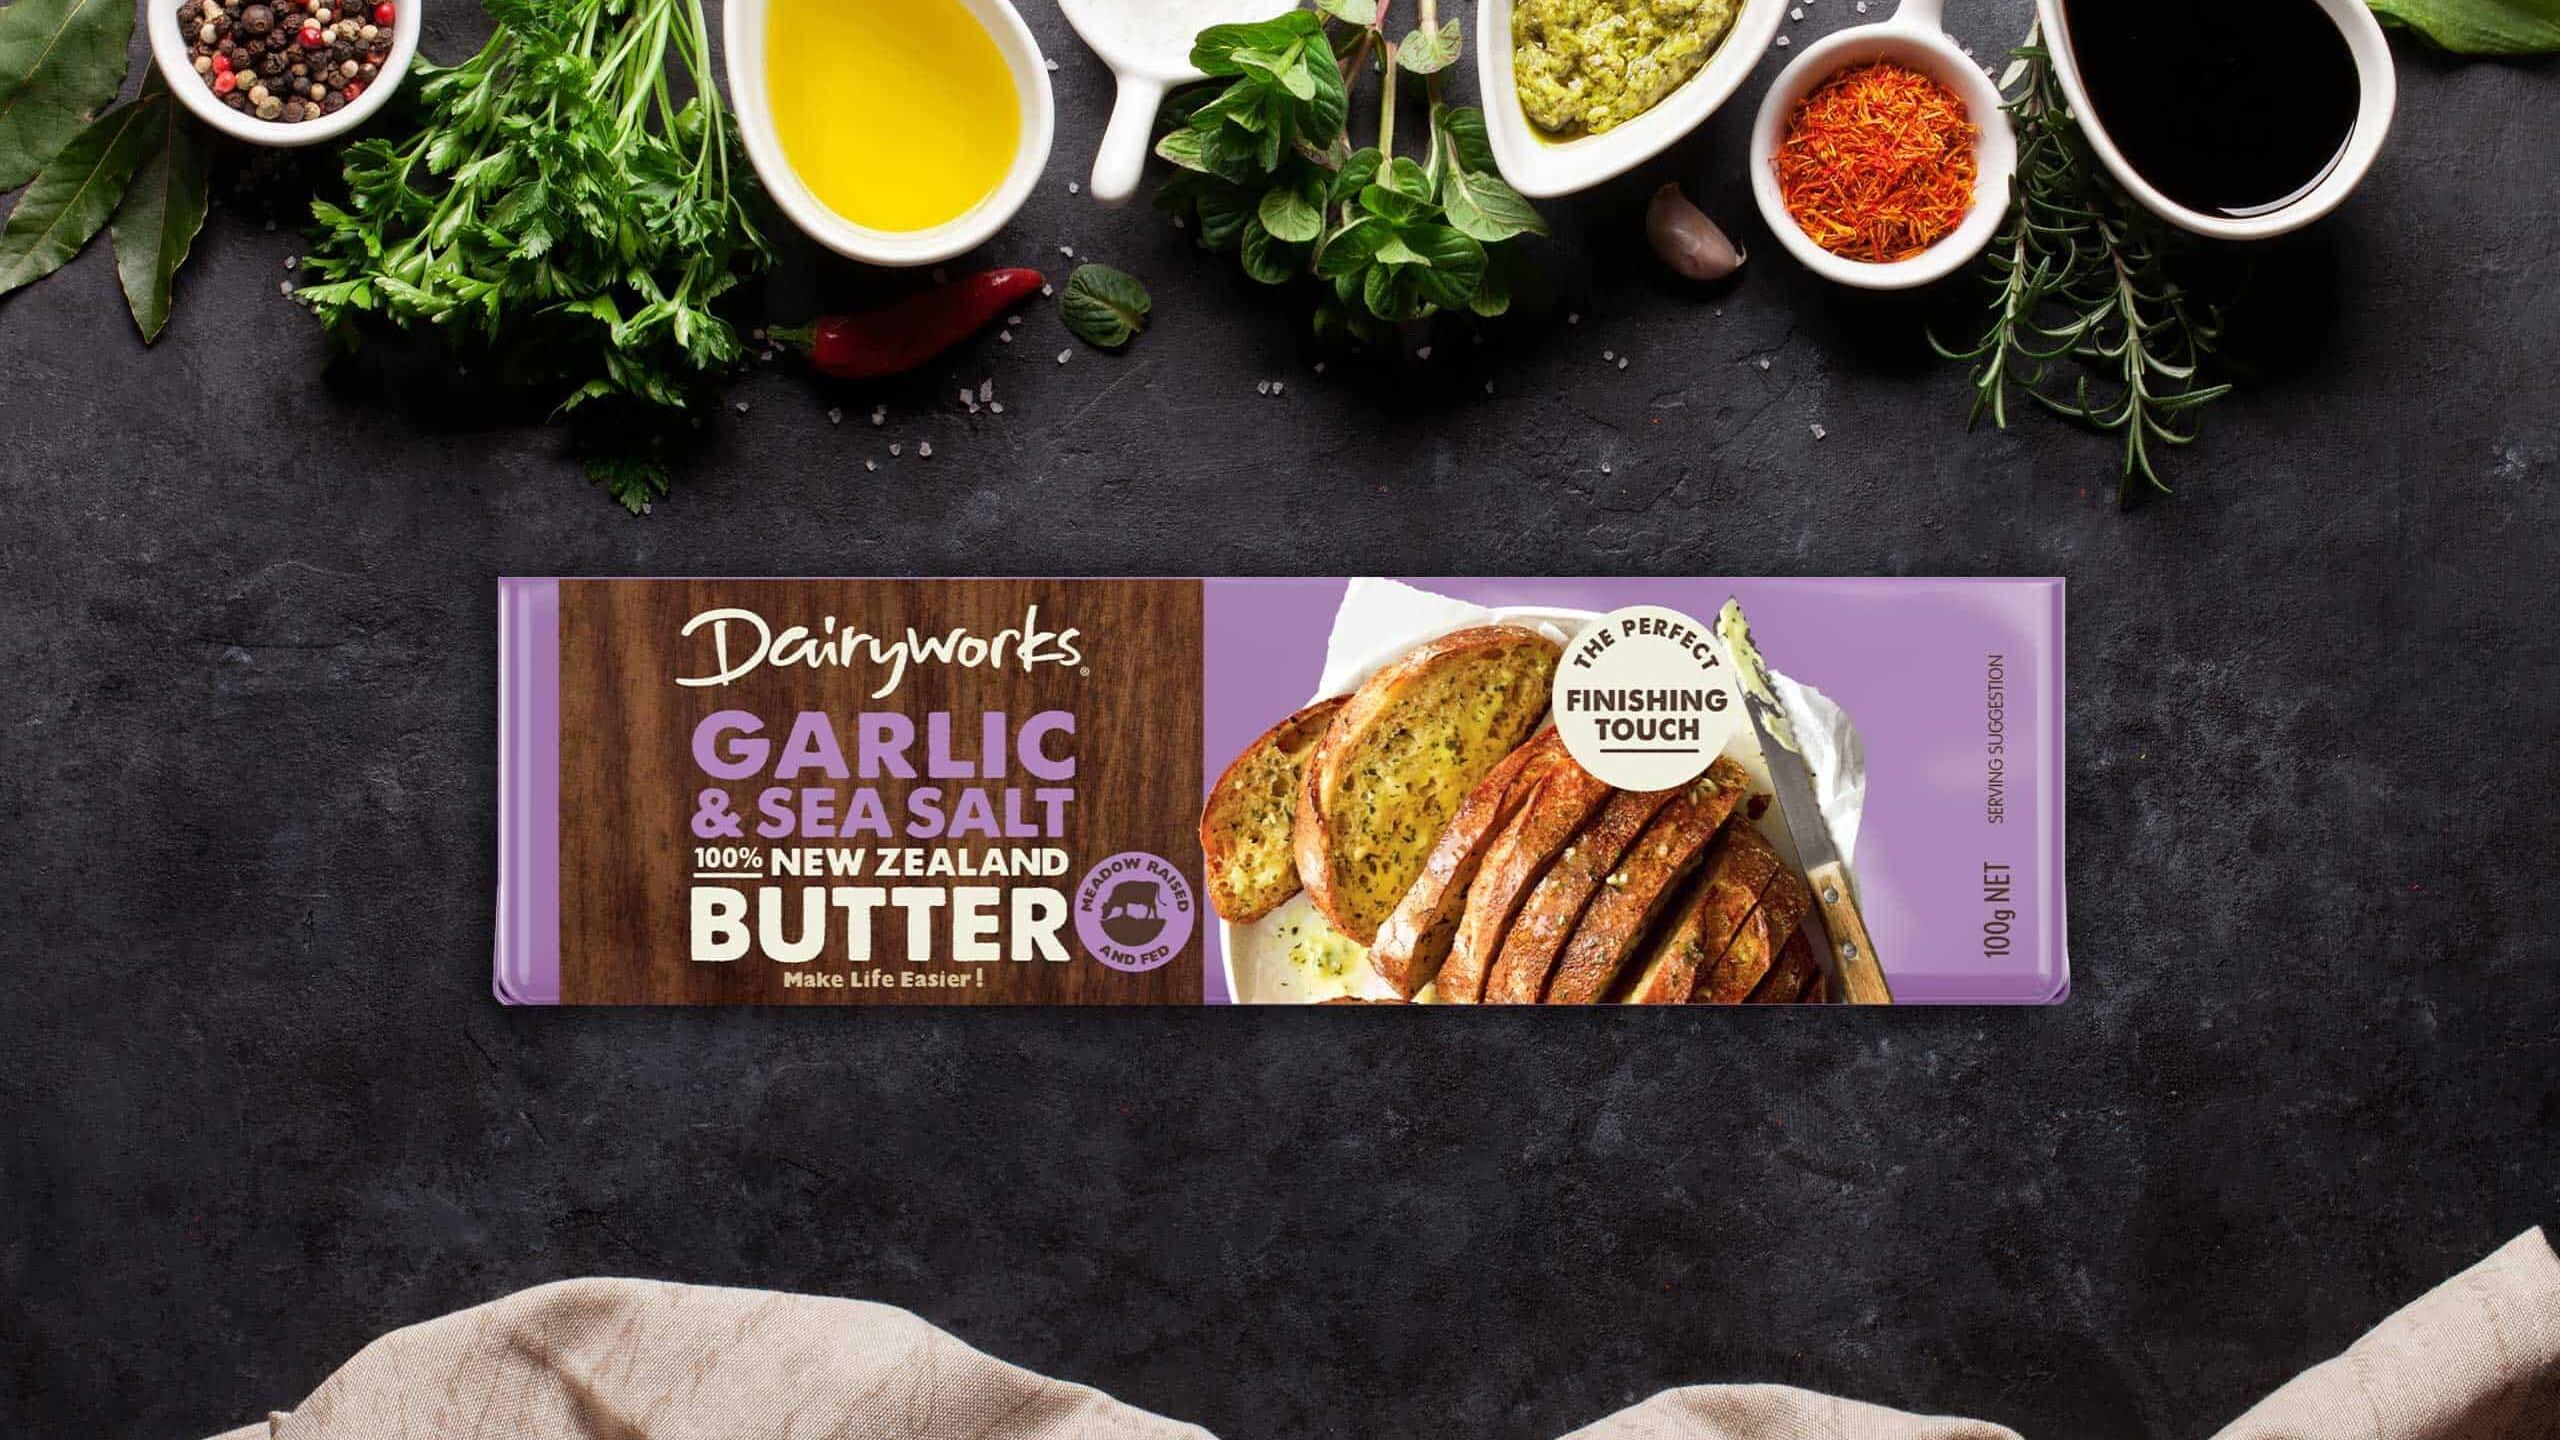 Dairyworks Garlic & Sea Salt 100% New Zealand Butter